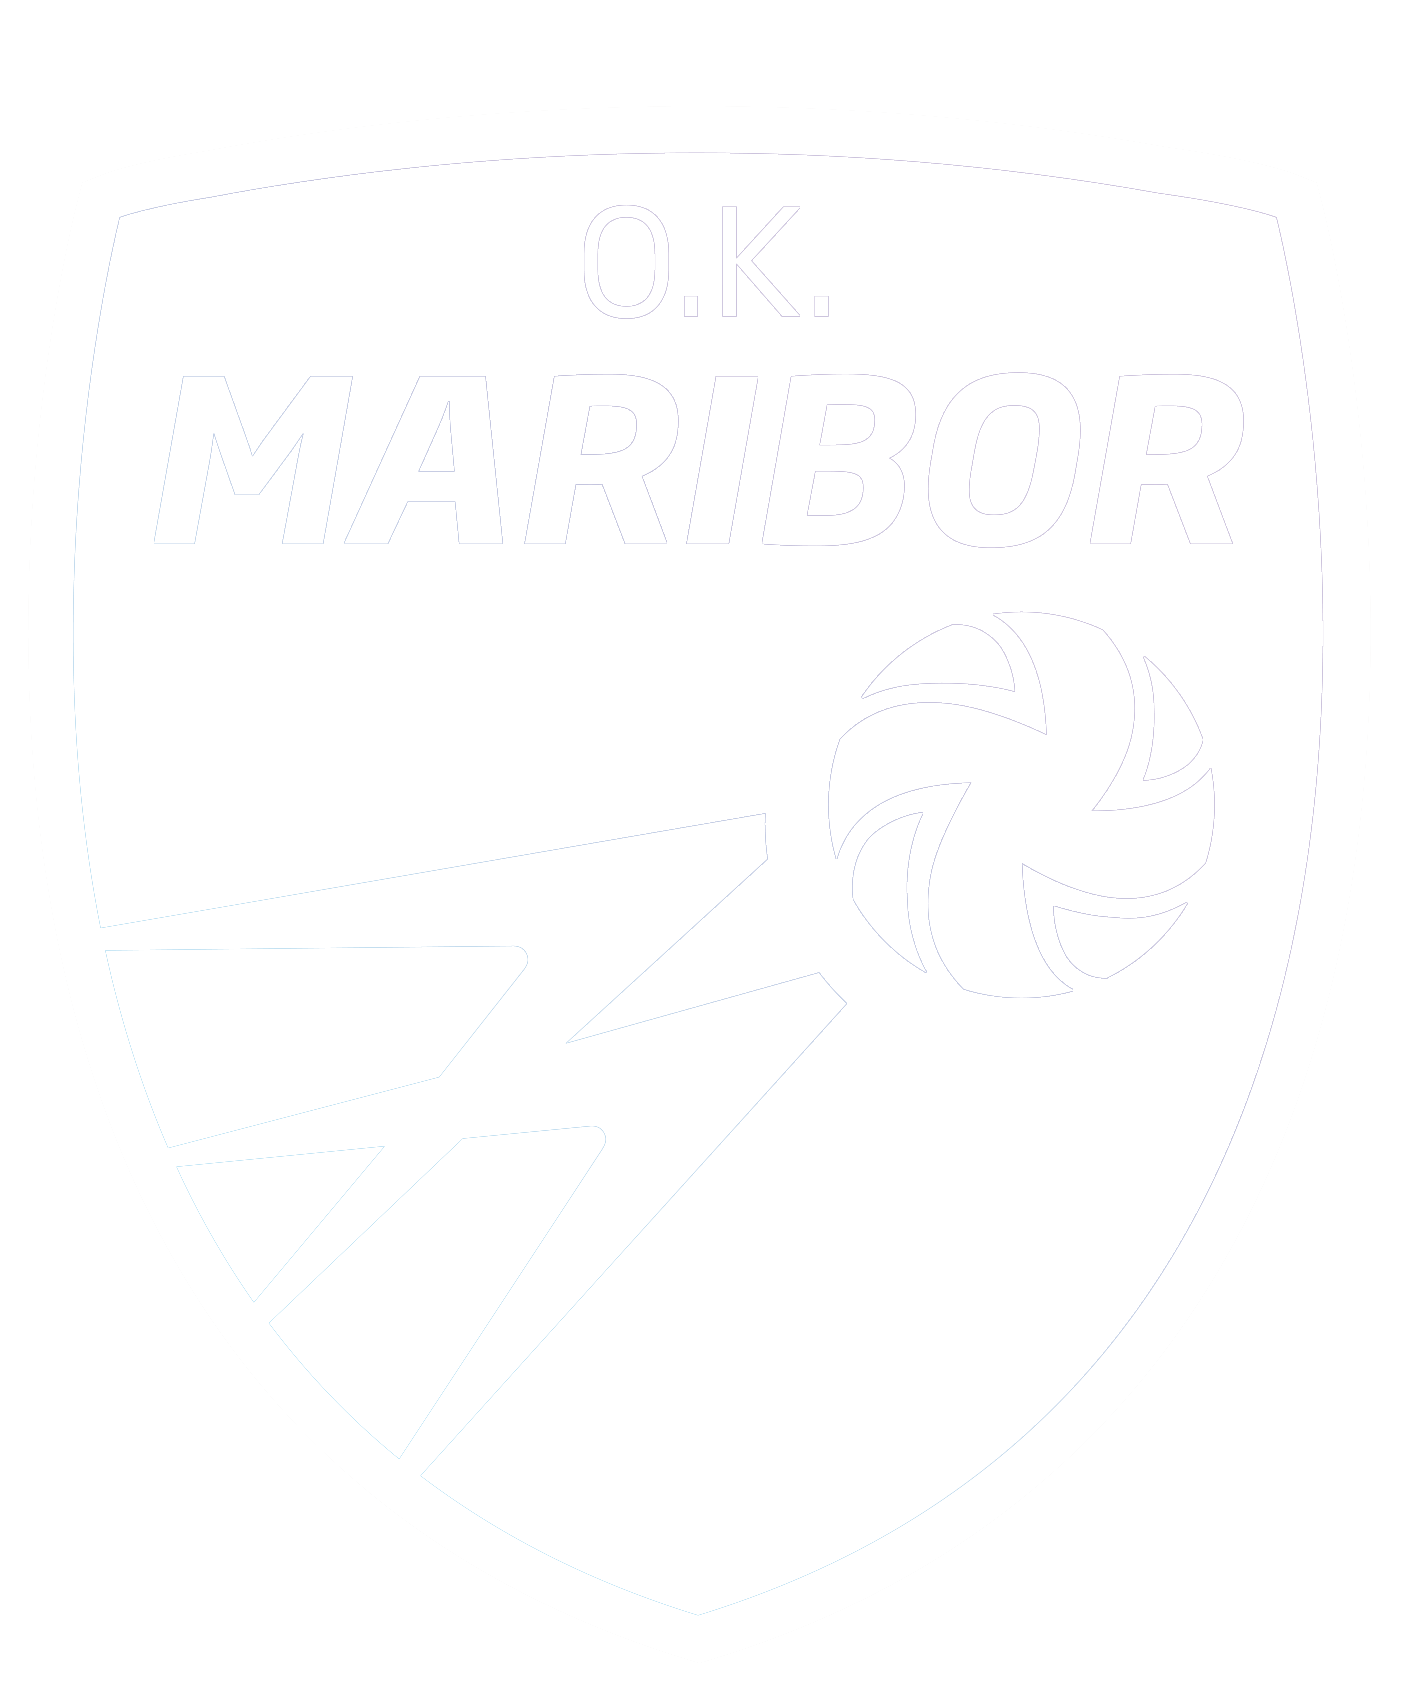 OK Merkur Maribor Logo